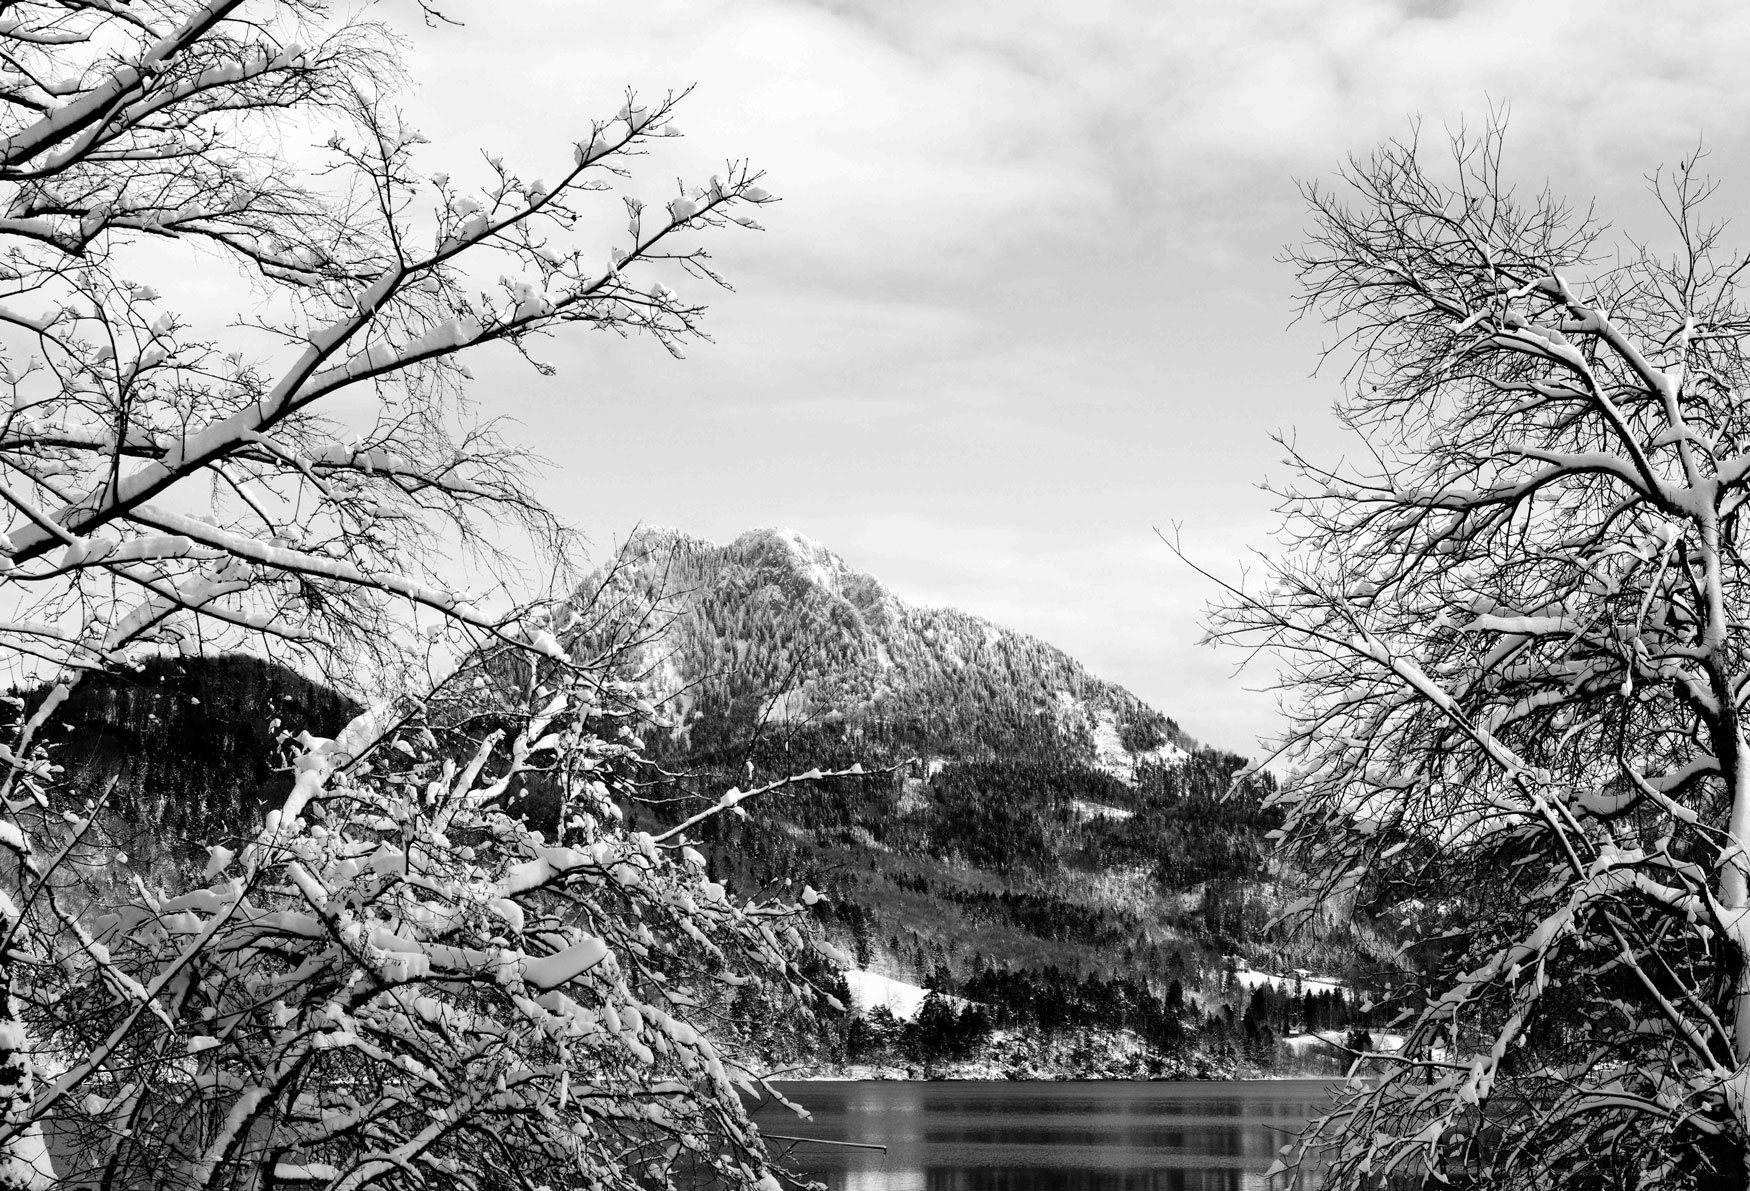 8612-Salzburg-area-lake-view-(bw).jpg